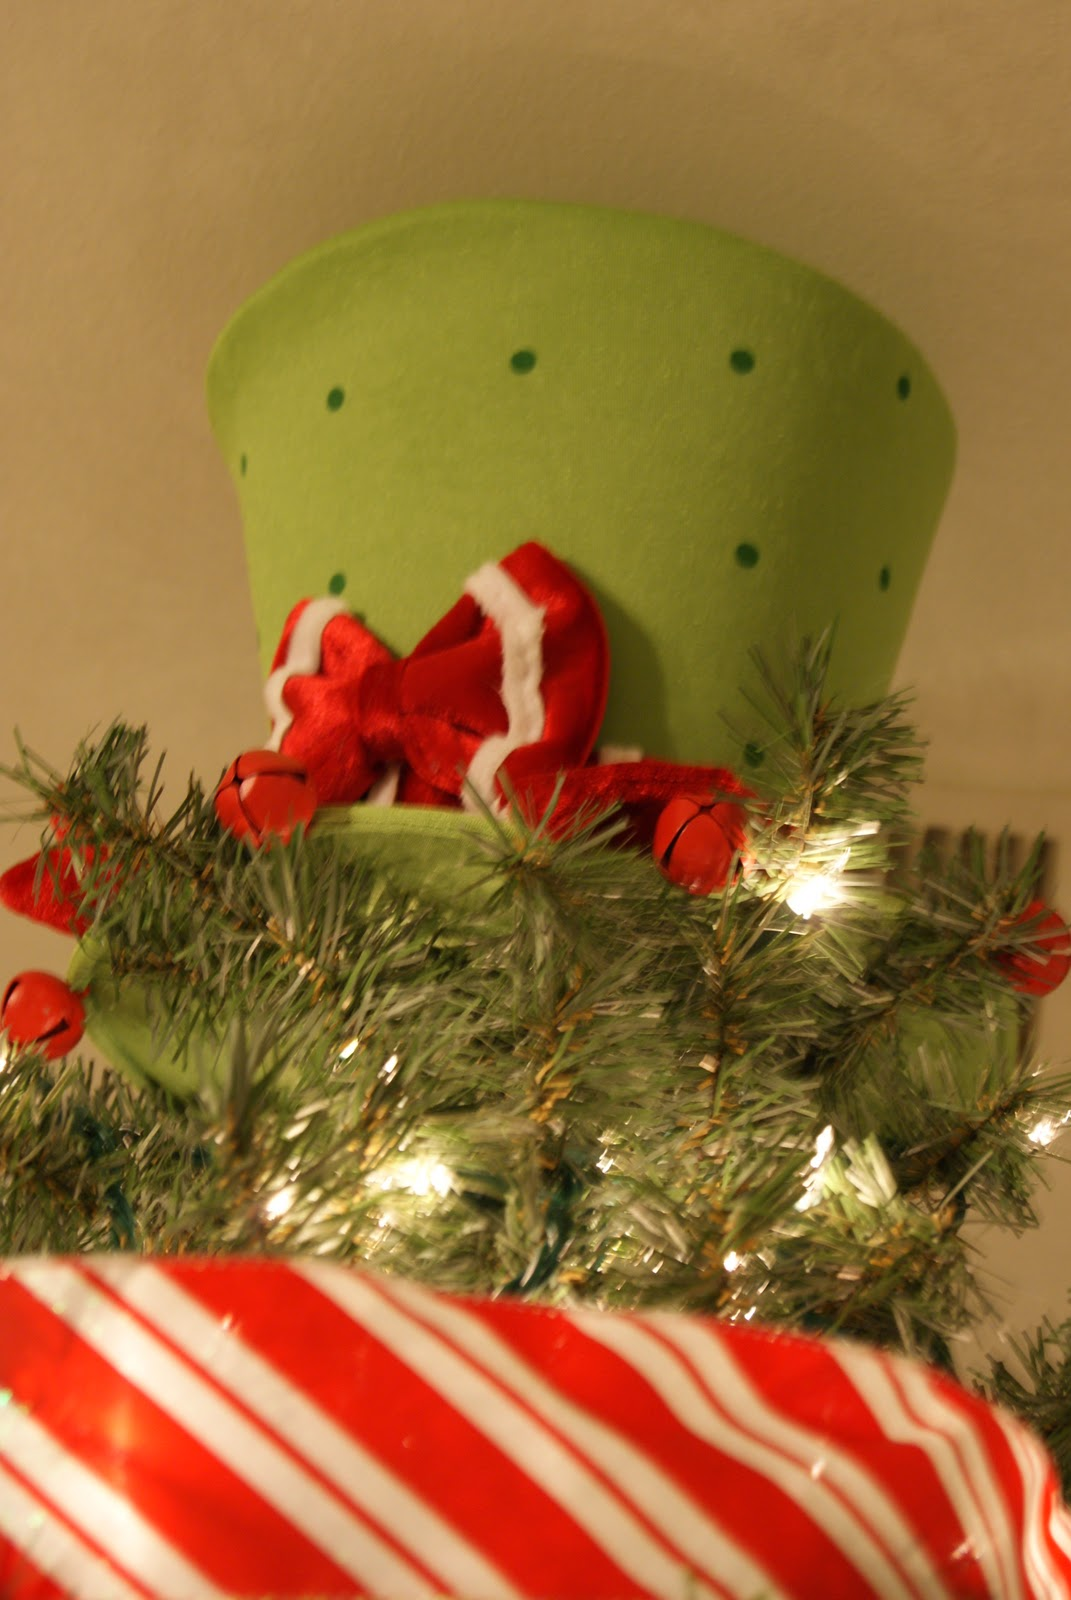 i love the tree topper top hat i got it from cracker barrel last december for 1499